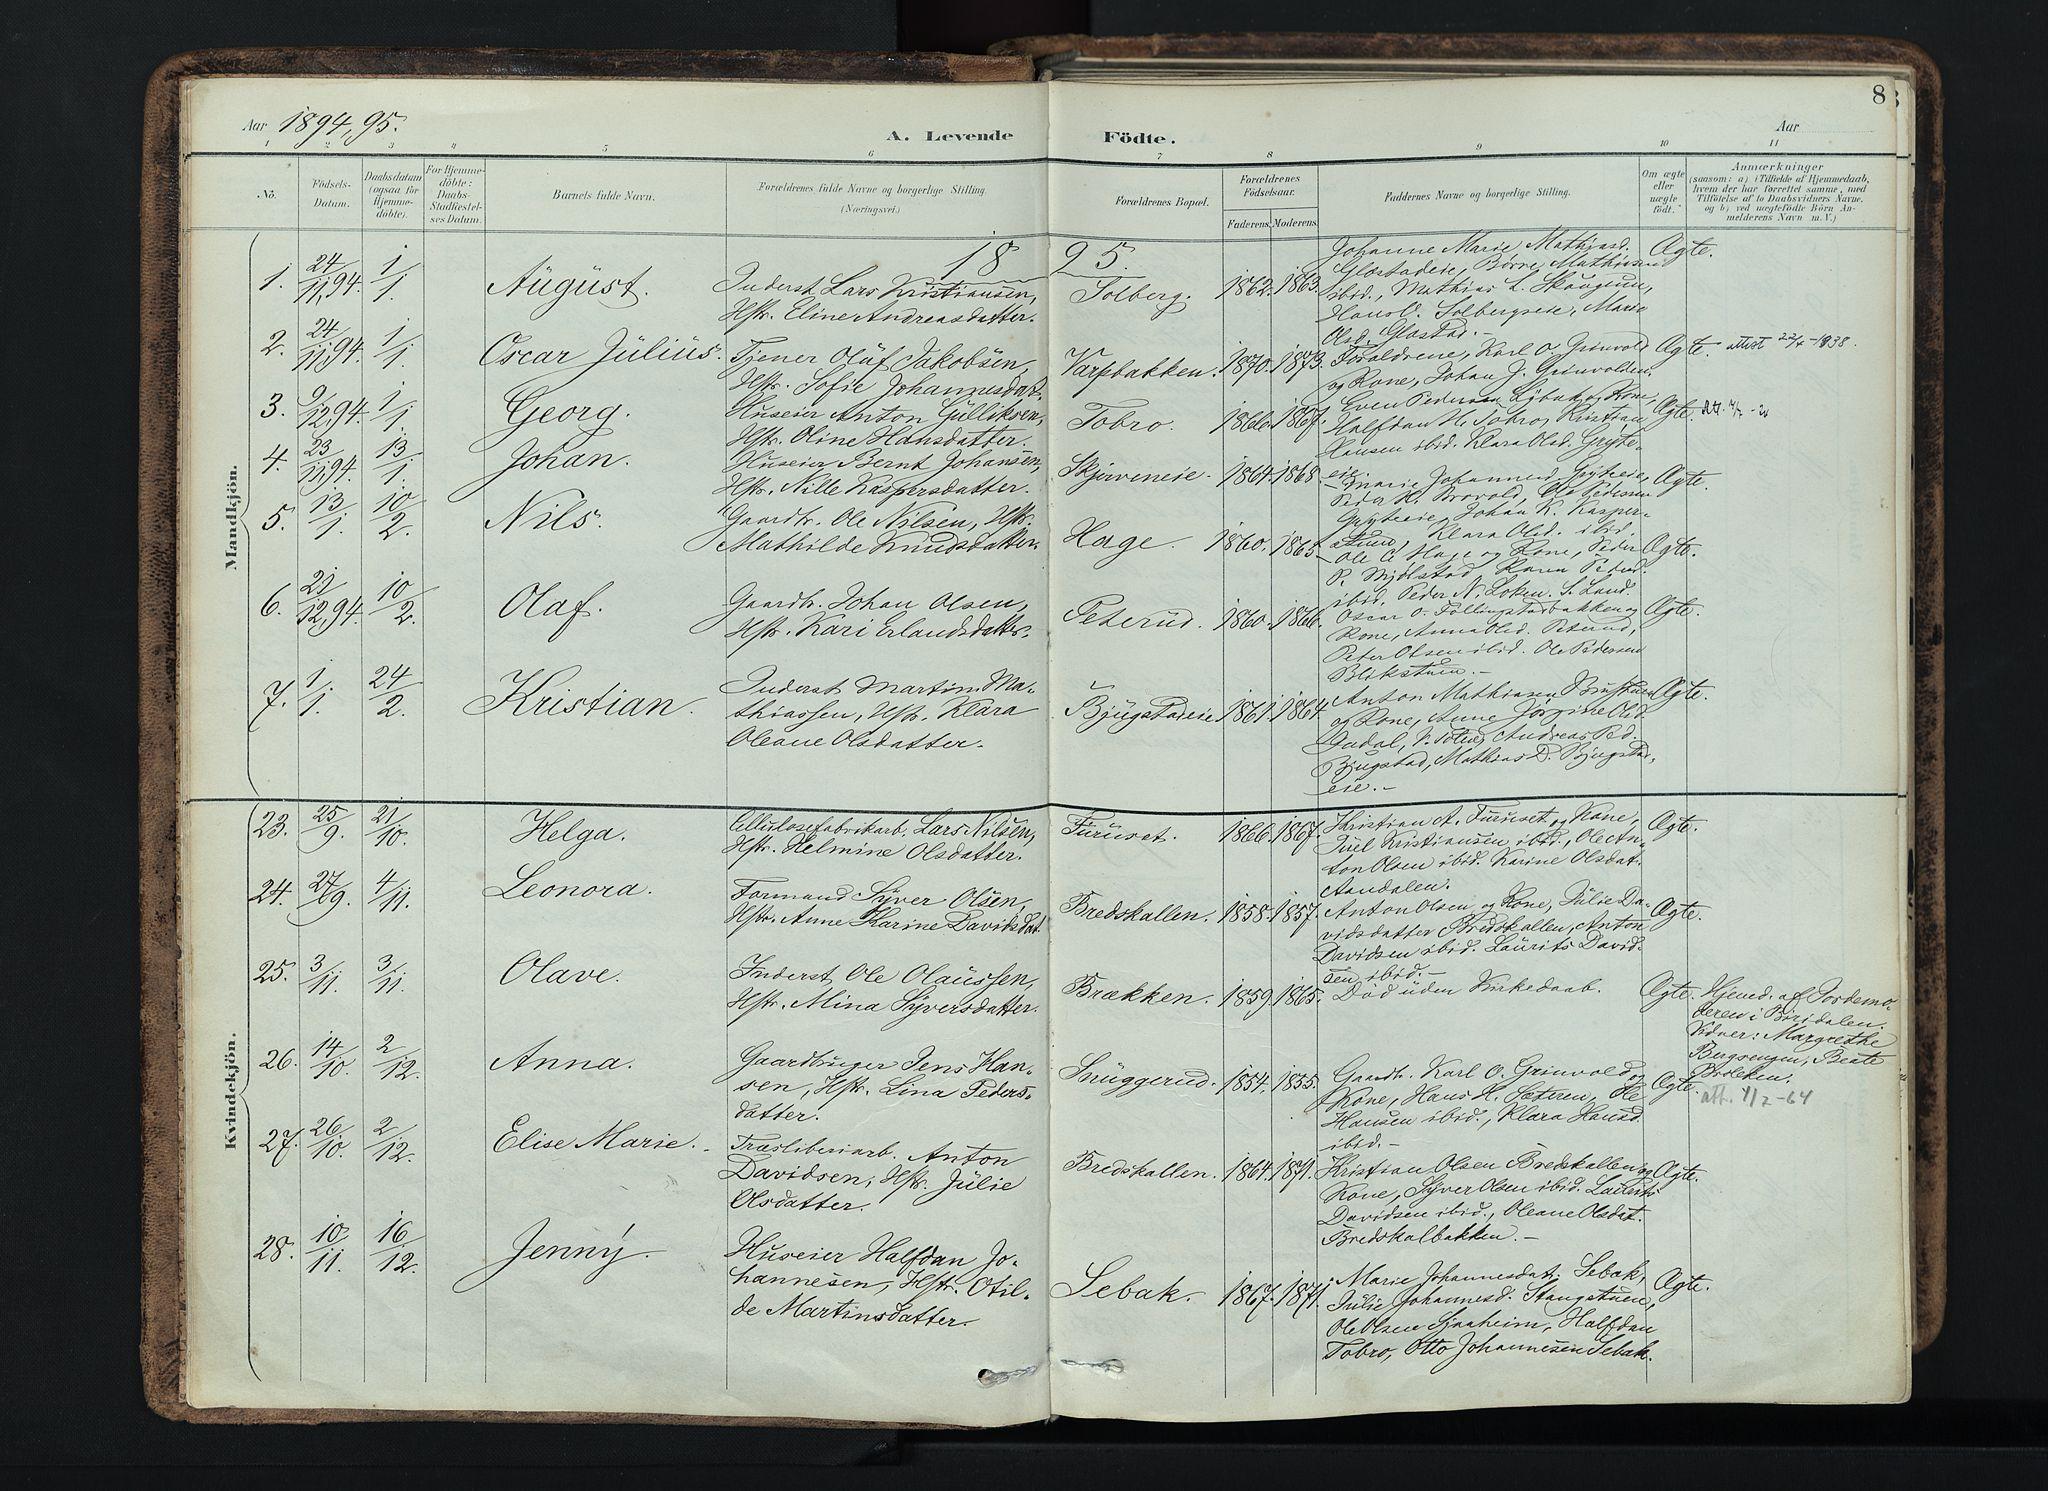 SAH, Vardal prestekontor, H/Ha/Haa/L0019: Ministerialbok nr. 19, 1893-1907, s. 8